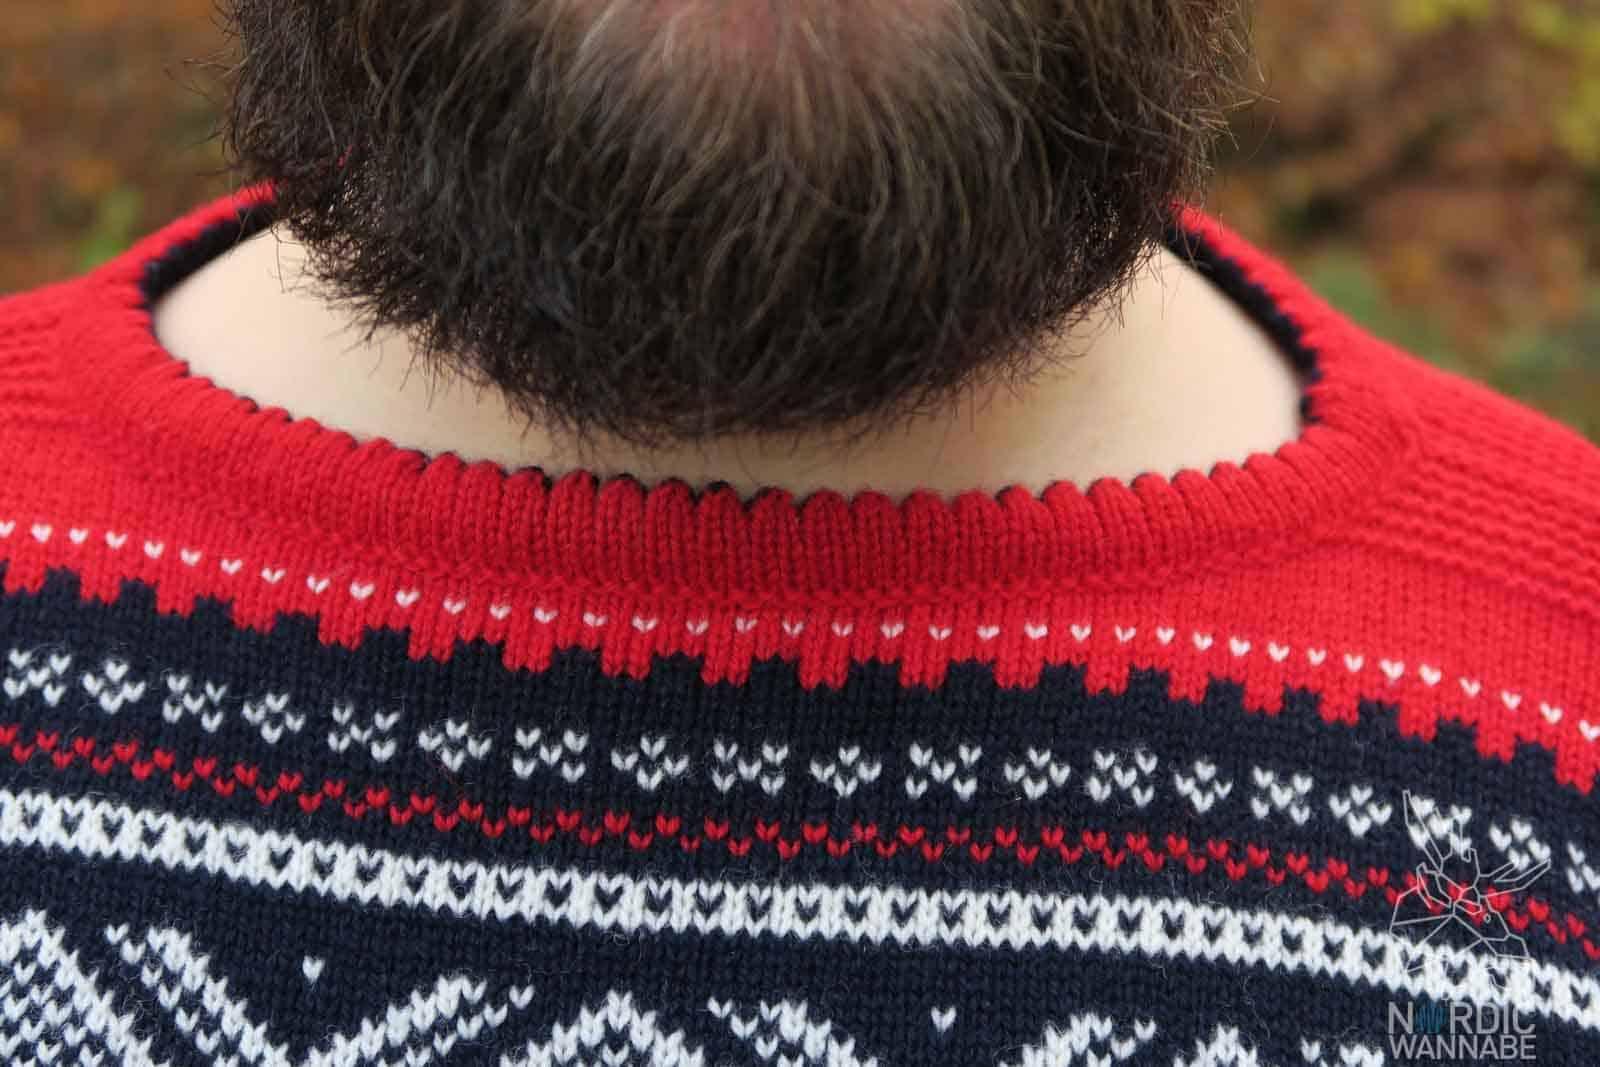 Norweger Pullover, Norweger Pulli, Stricken, Strickanleitung, Wo kann man kaufen, Oslo, Norwegen Blog, Norwegen, Marius Muster, Oslo Sweatershop,